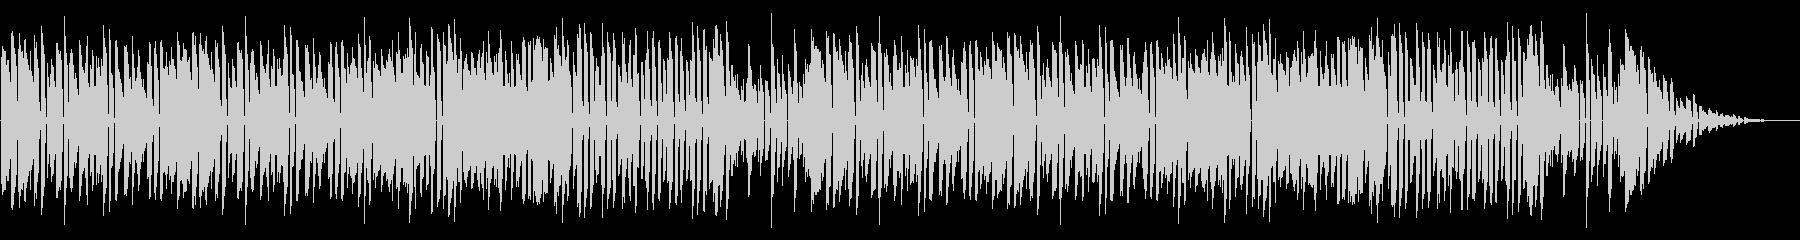 NES アクションD03-1(ステージ2の未再生の波形